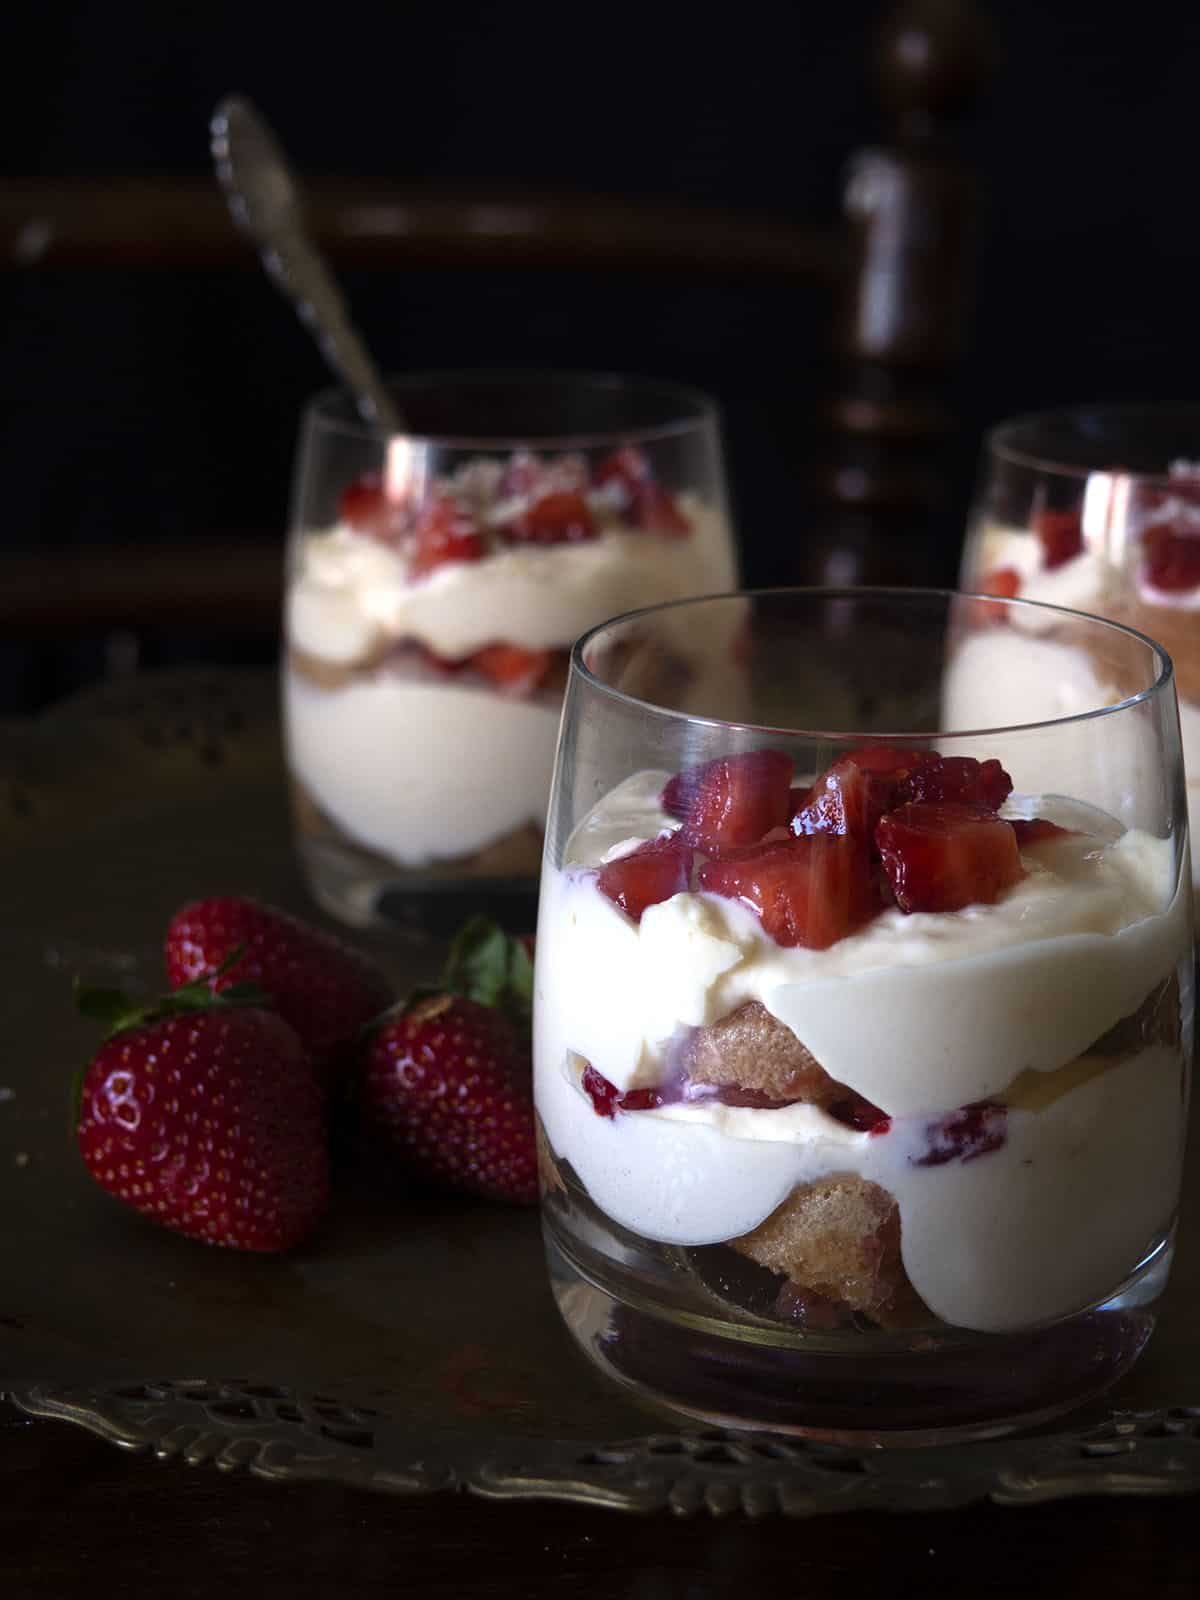 strawberry tiramisu, τιραμισού με φράουλες